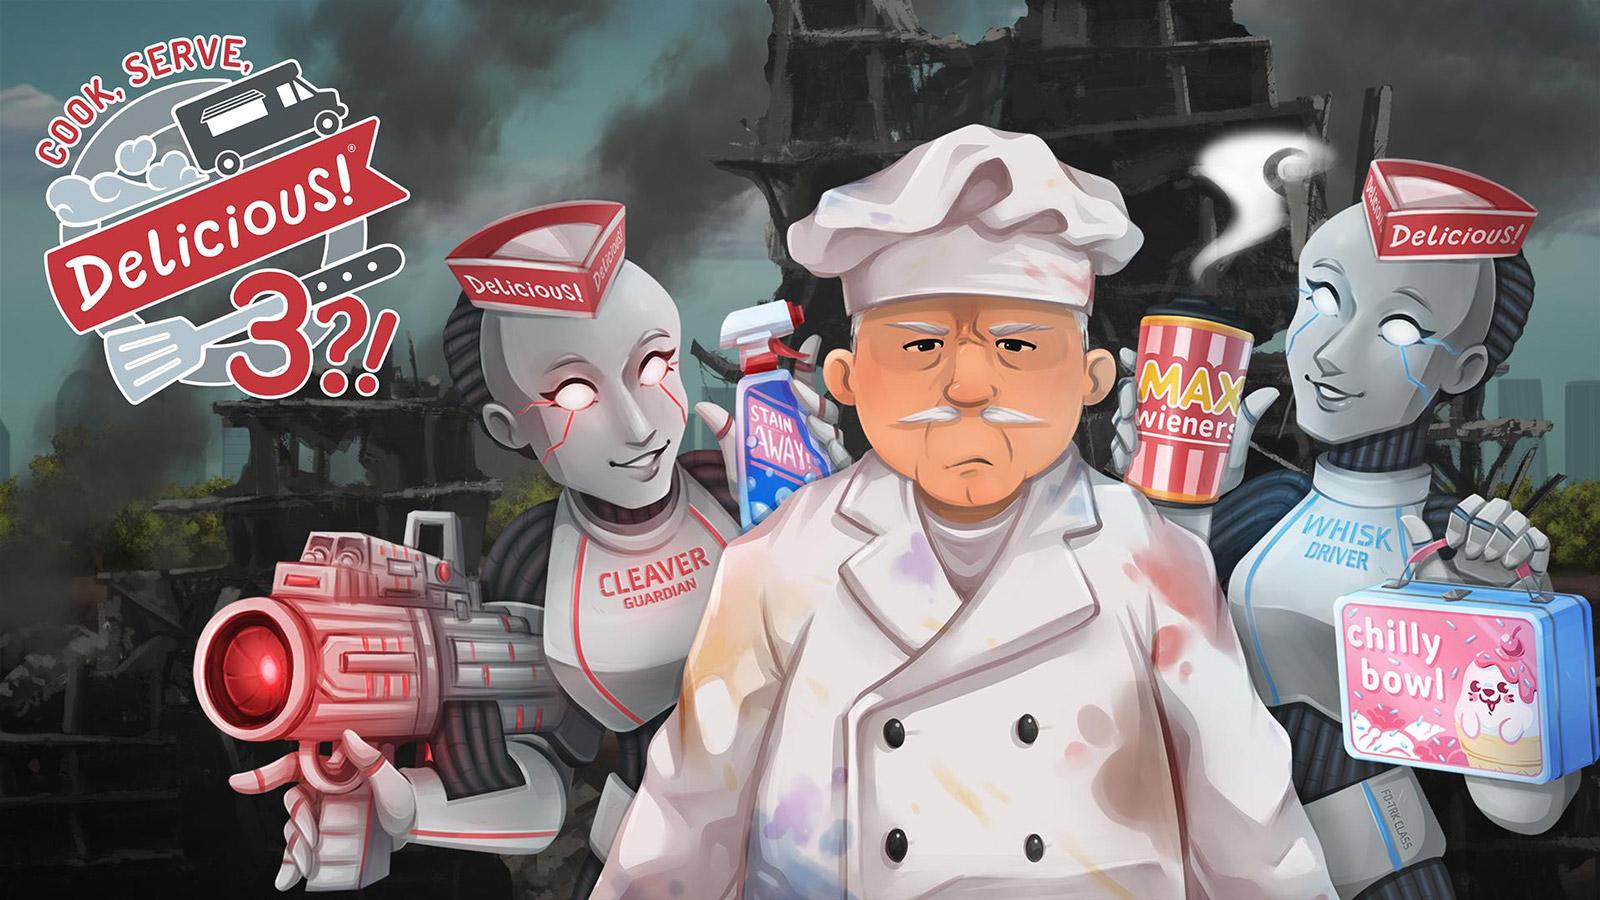 Cook, Serve, Delicious! 3?! Wallpaper in 1600x900